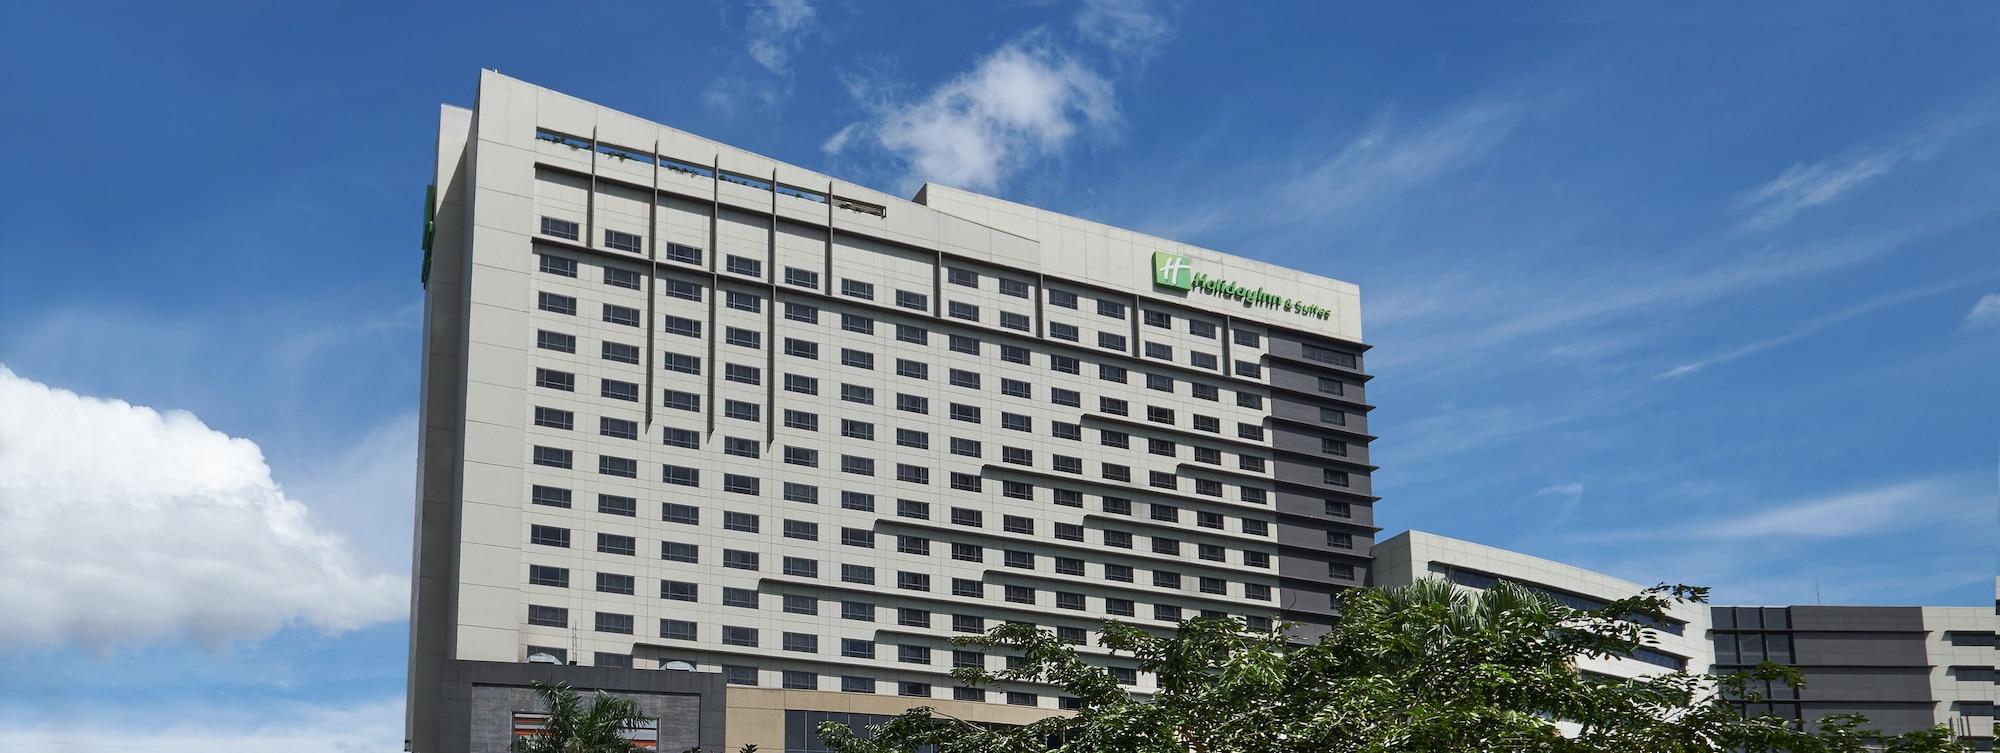 Holiday Inn & Suites Makati, Makati City